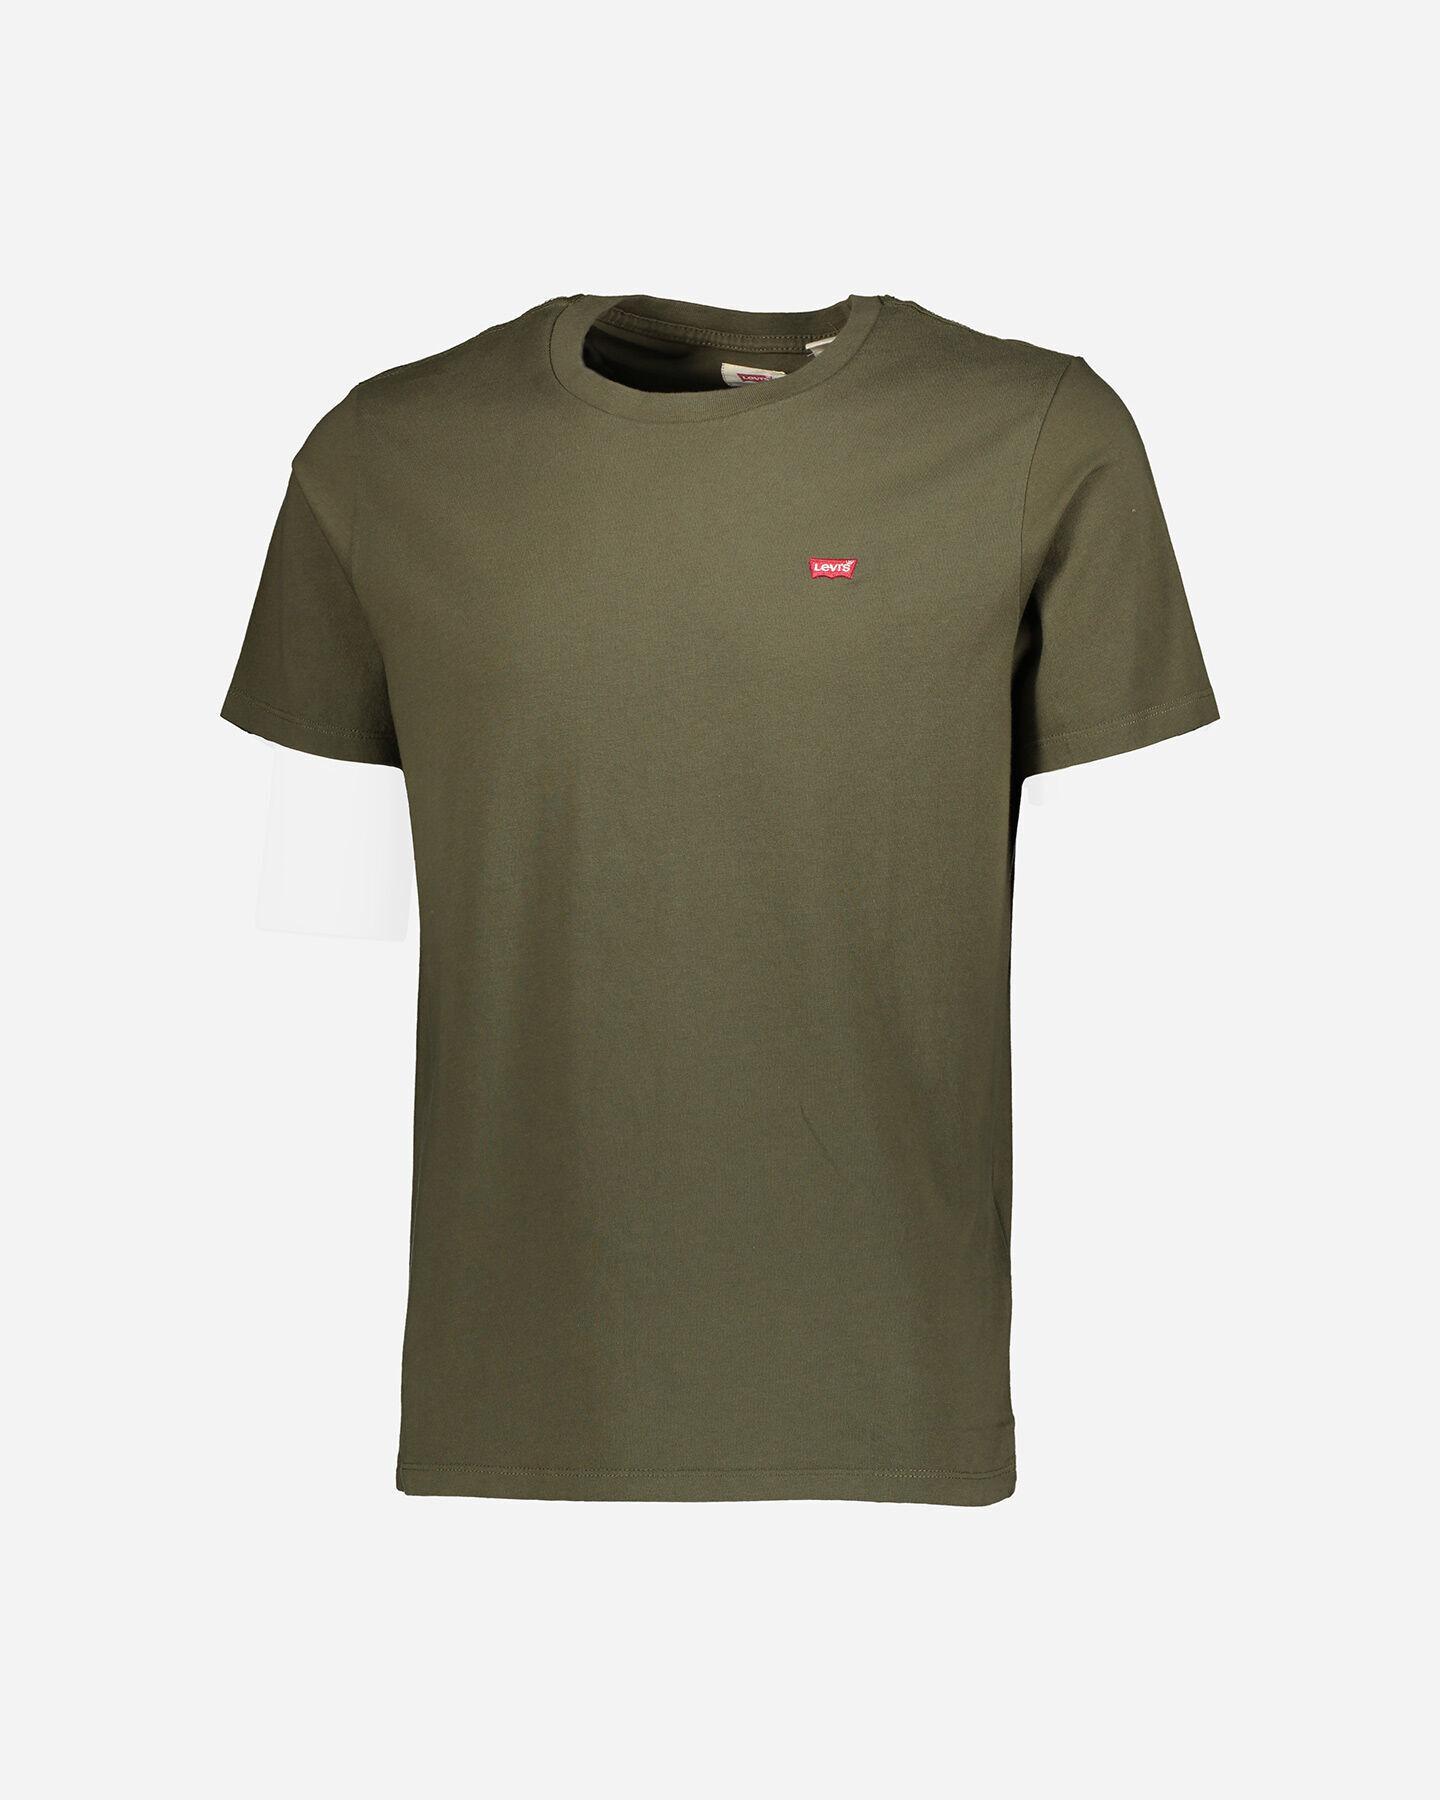 T-Shirt LEVI'S ORIGINAL M S4076919 scatto 5